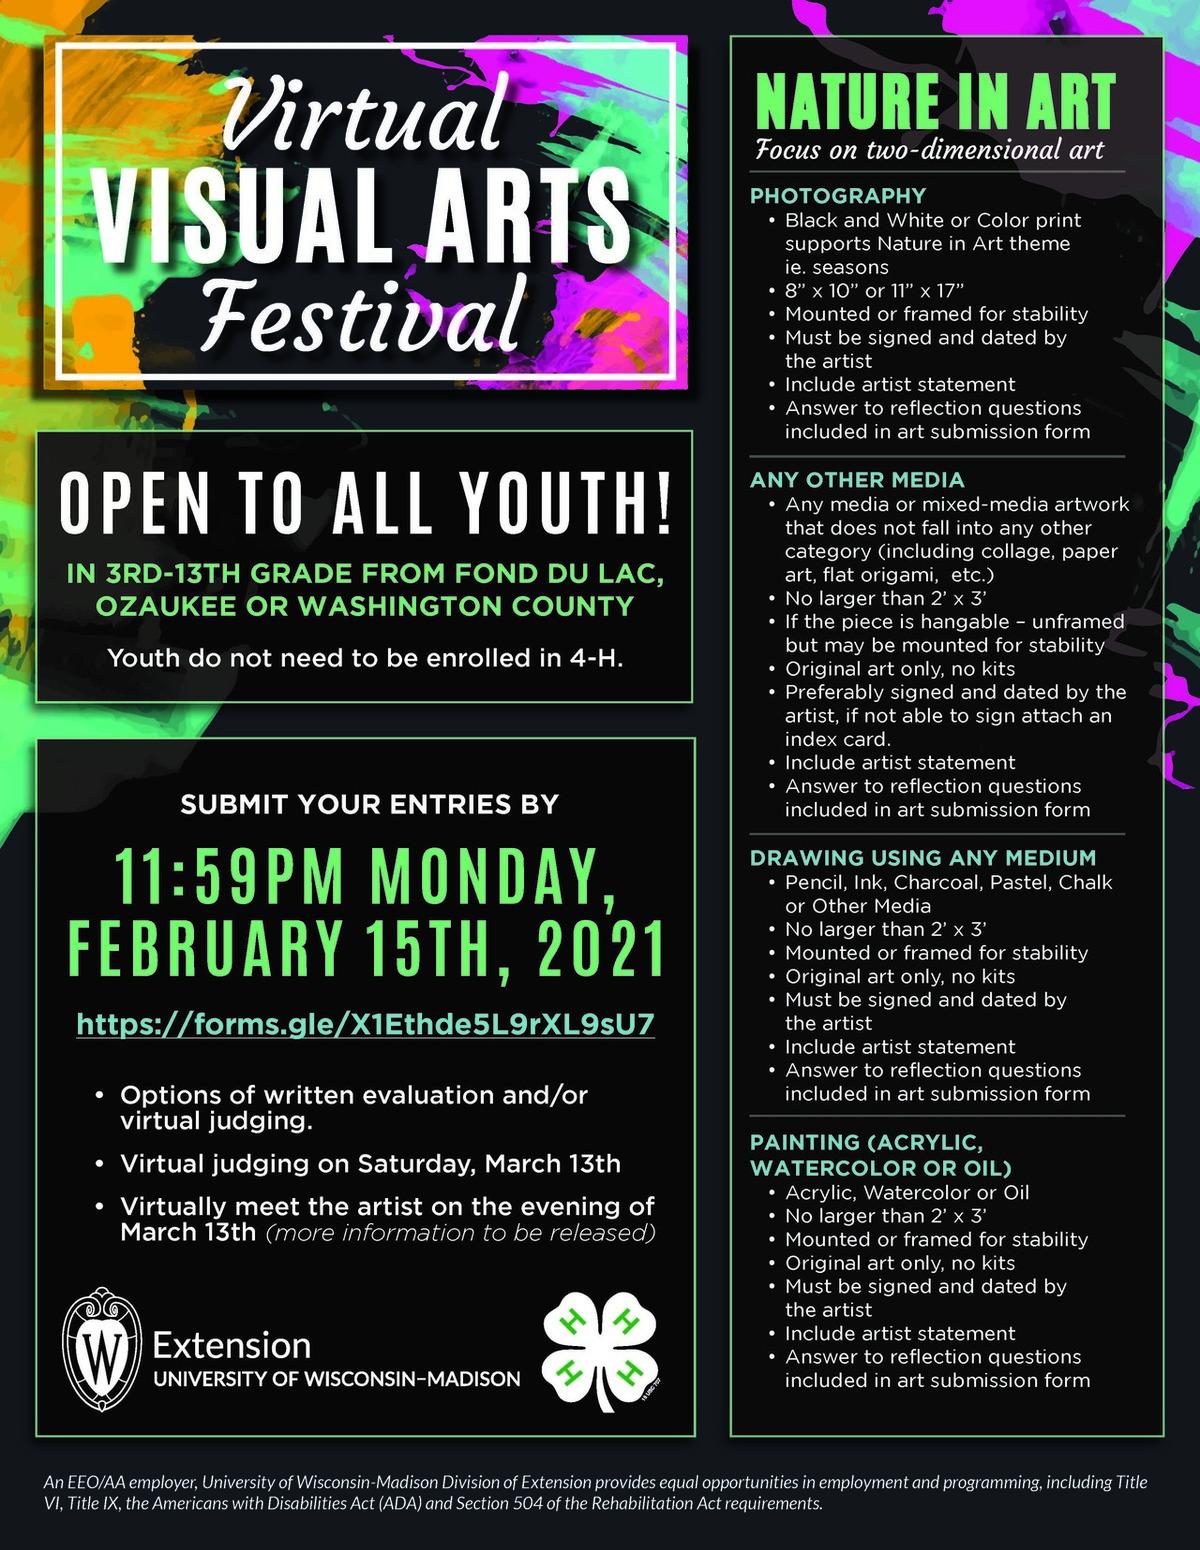 Registration for Virtual Visual Arts Festival